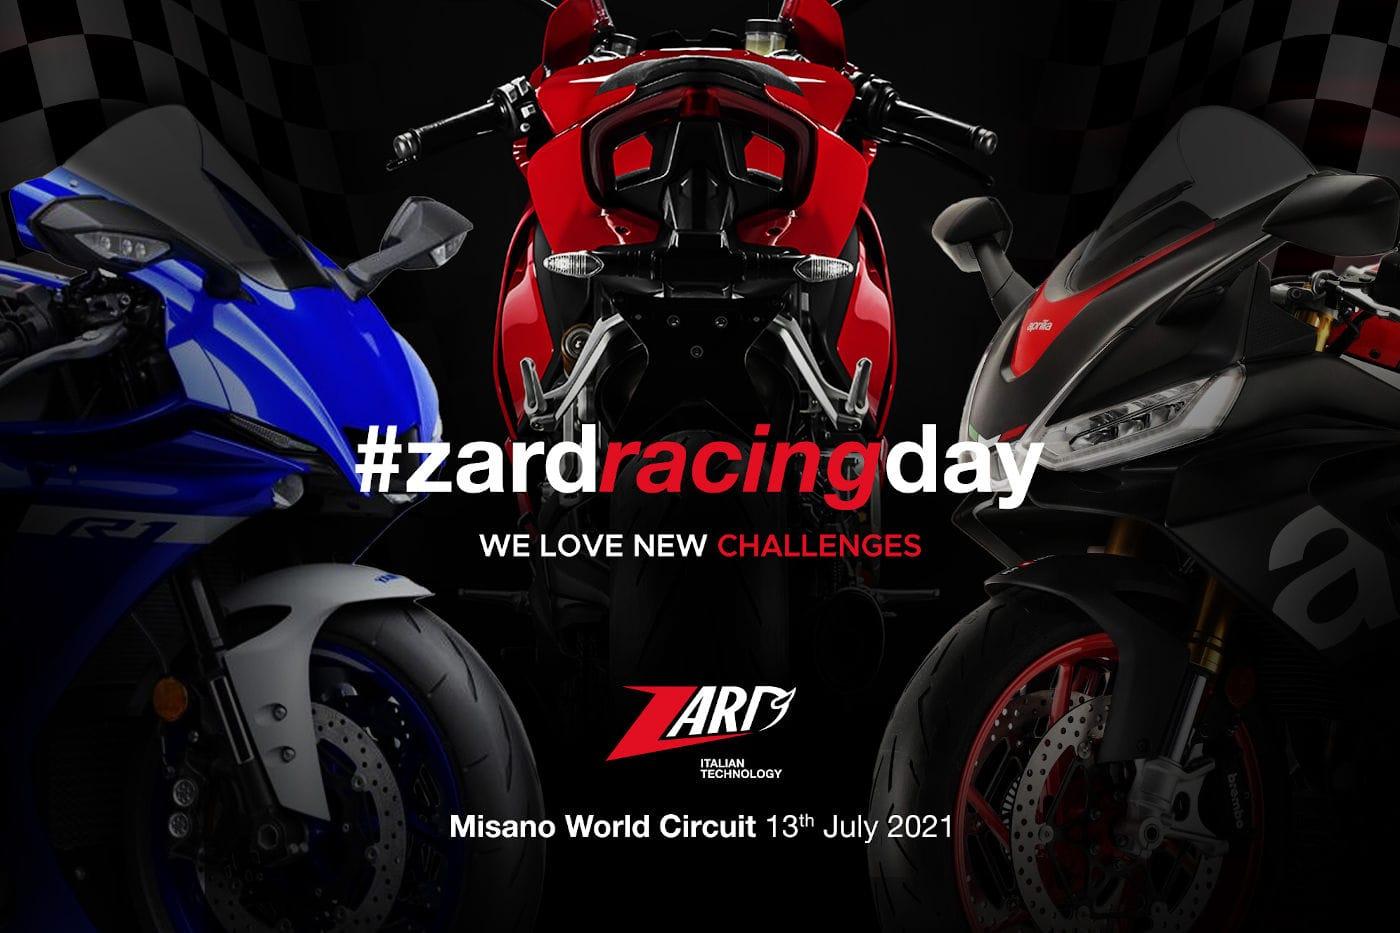 Zard Racing Day 2021